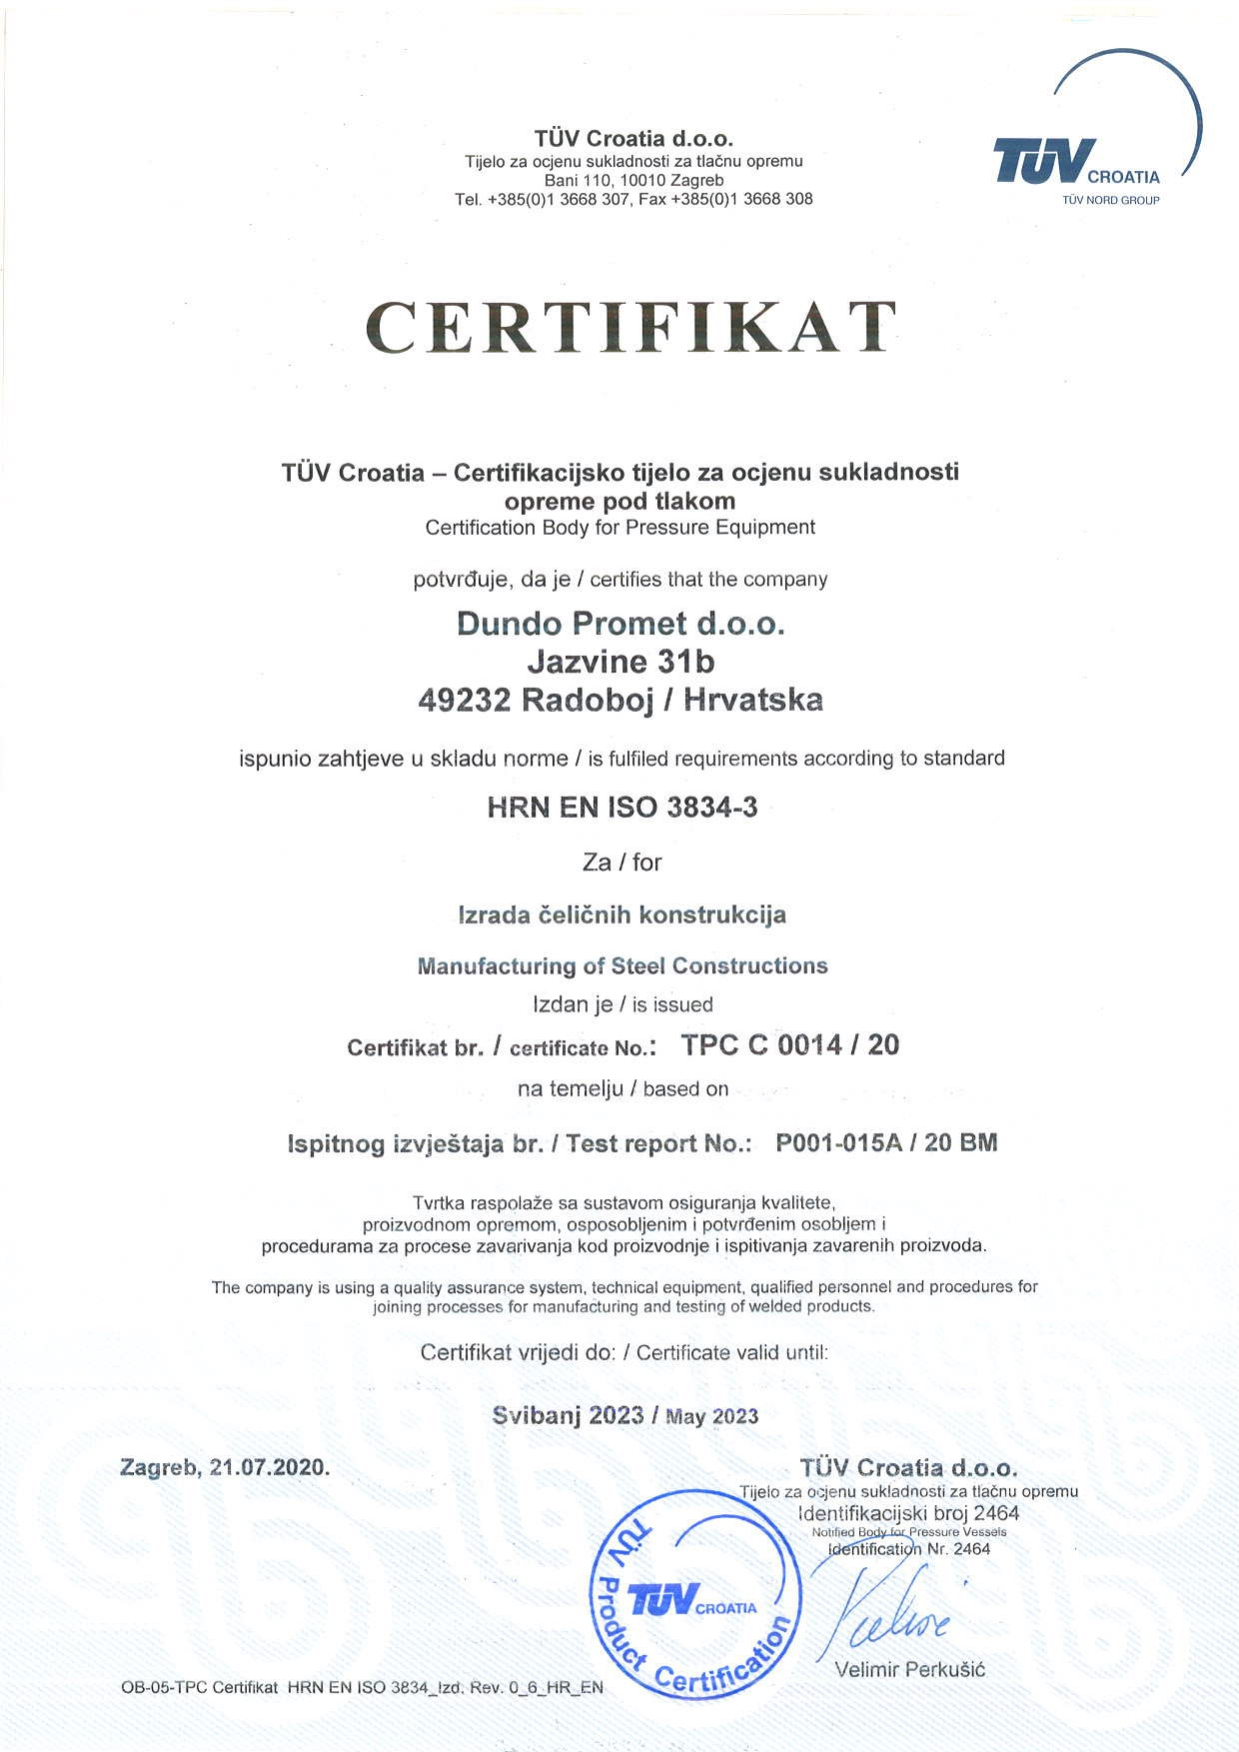 Dundo certifikat HRN EN ISO 3834 1-150